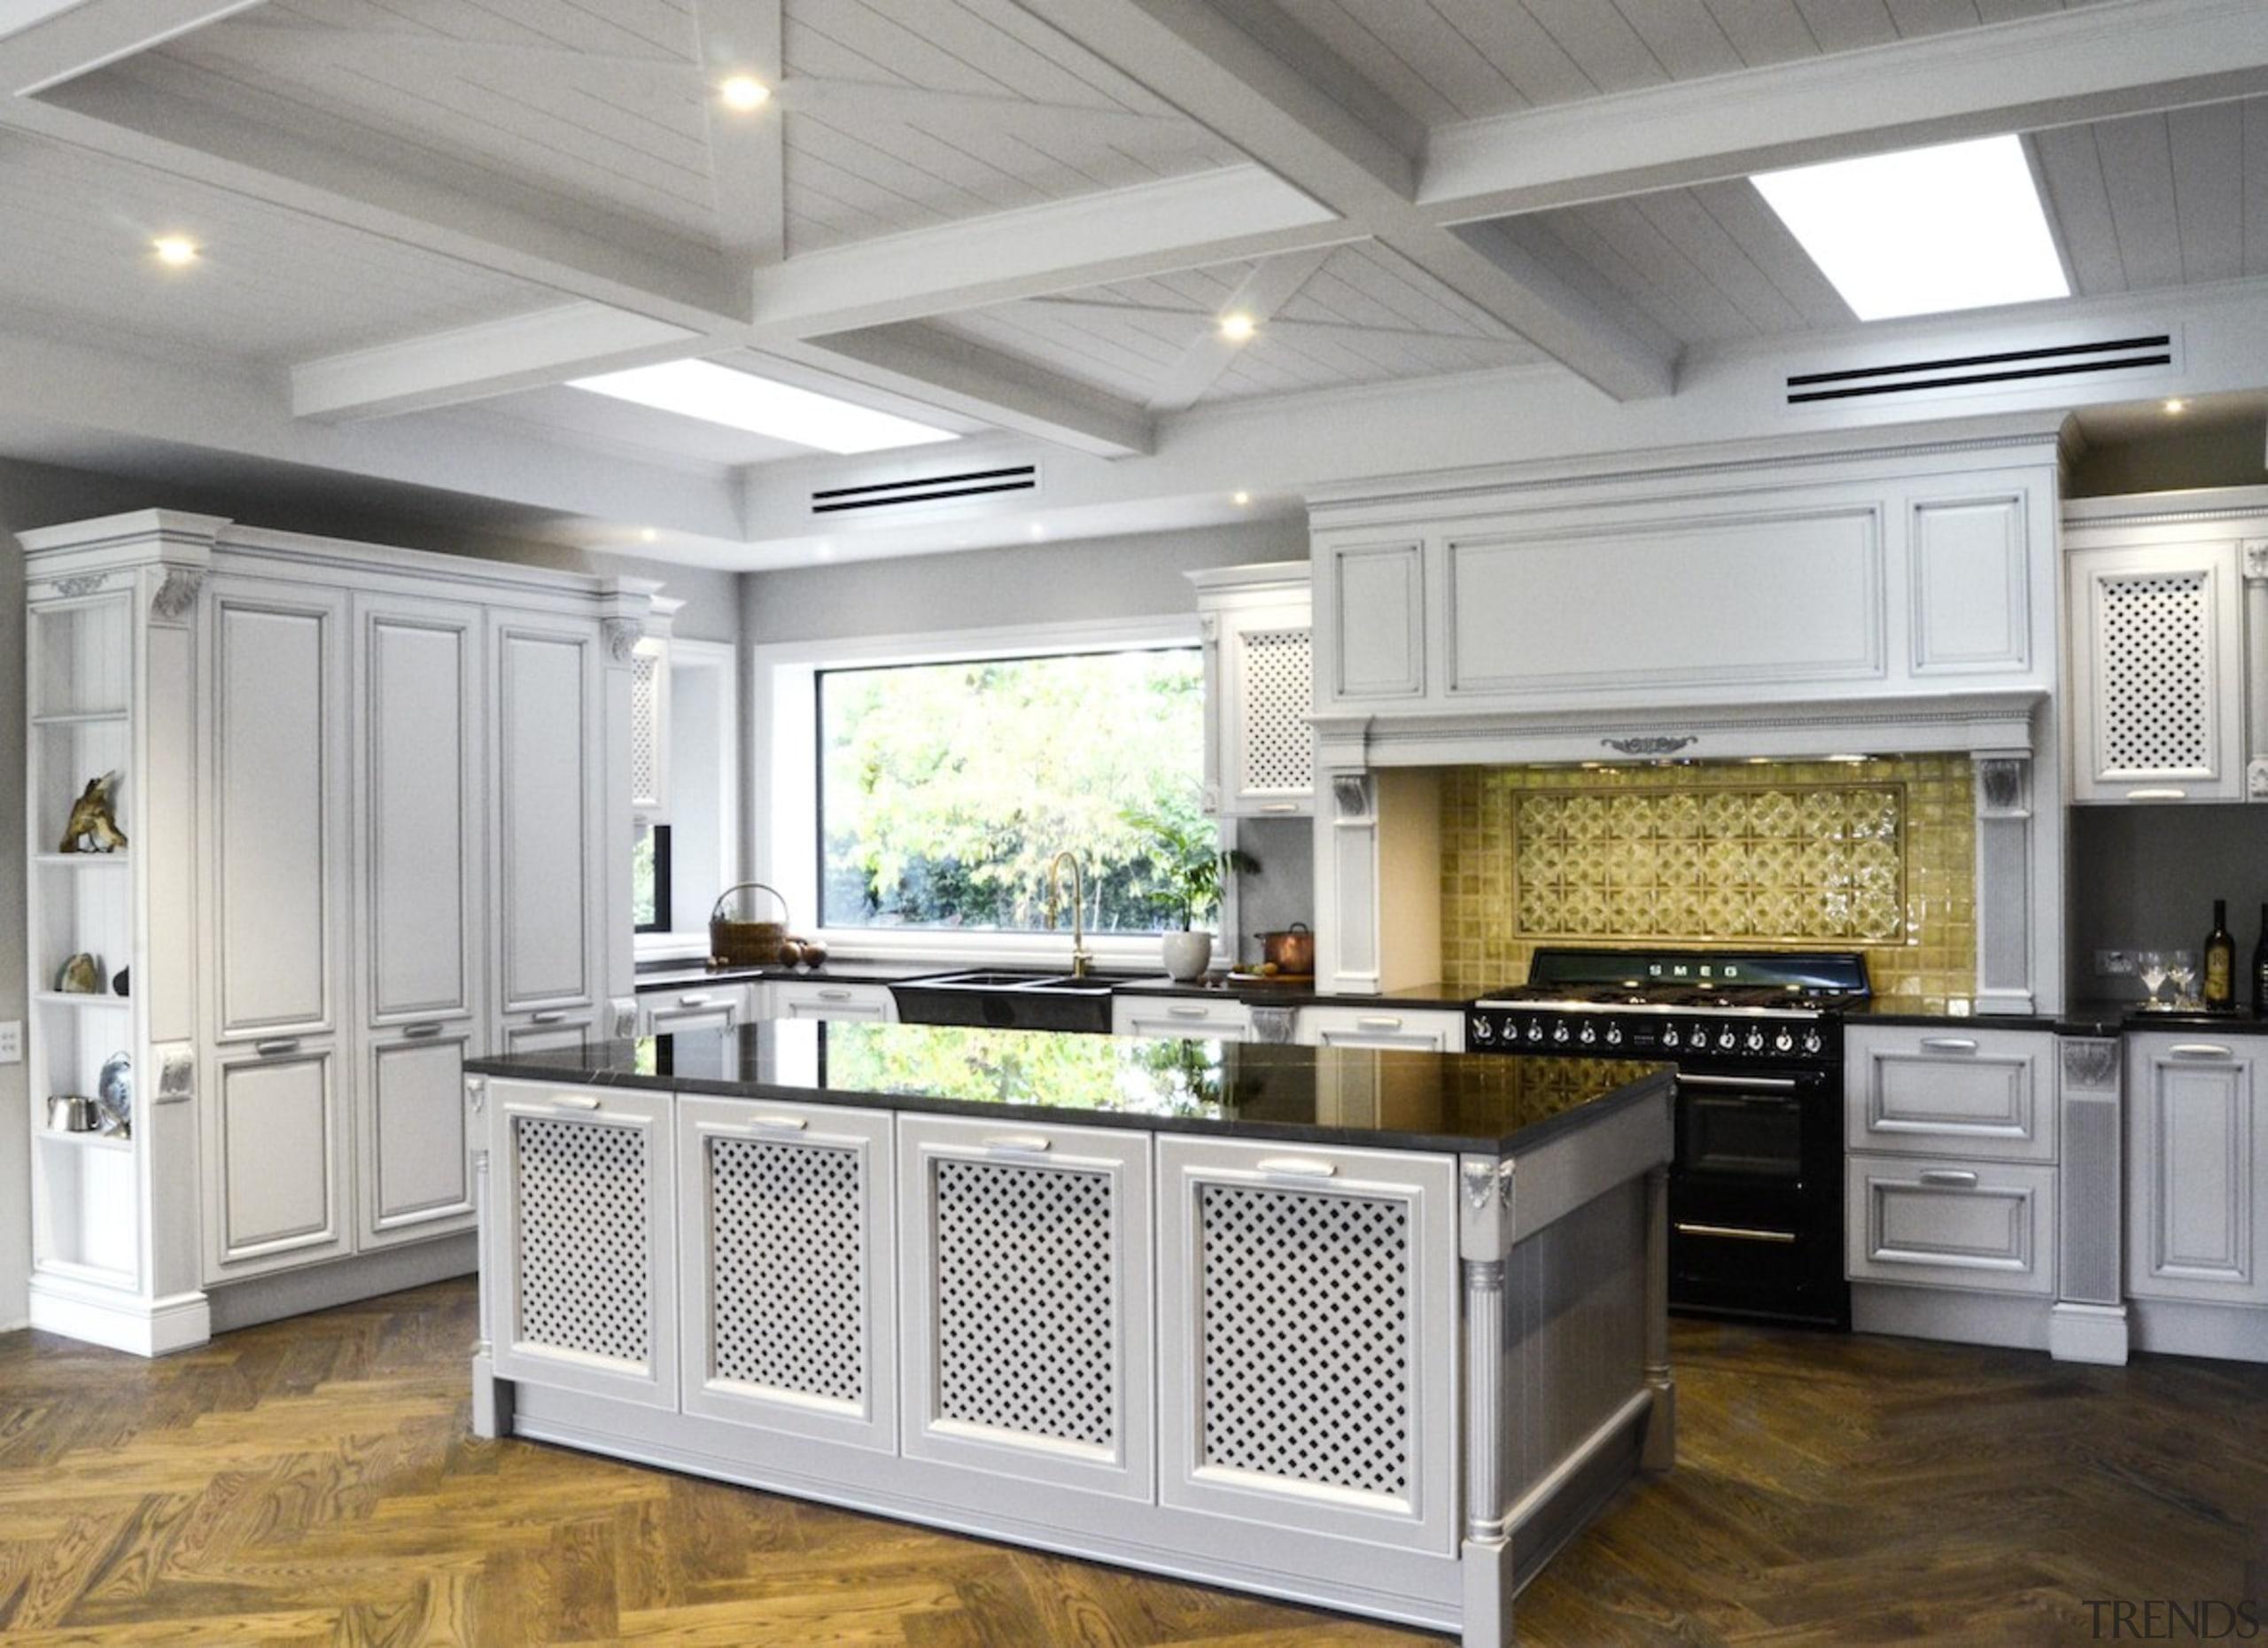 TIDA New Zealand Kitchens – proudly brought to cabinetry, countertop, cuisine classique, floor, flooring, interior design, kitchen, gray